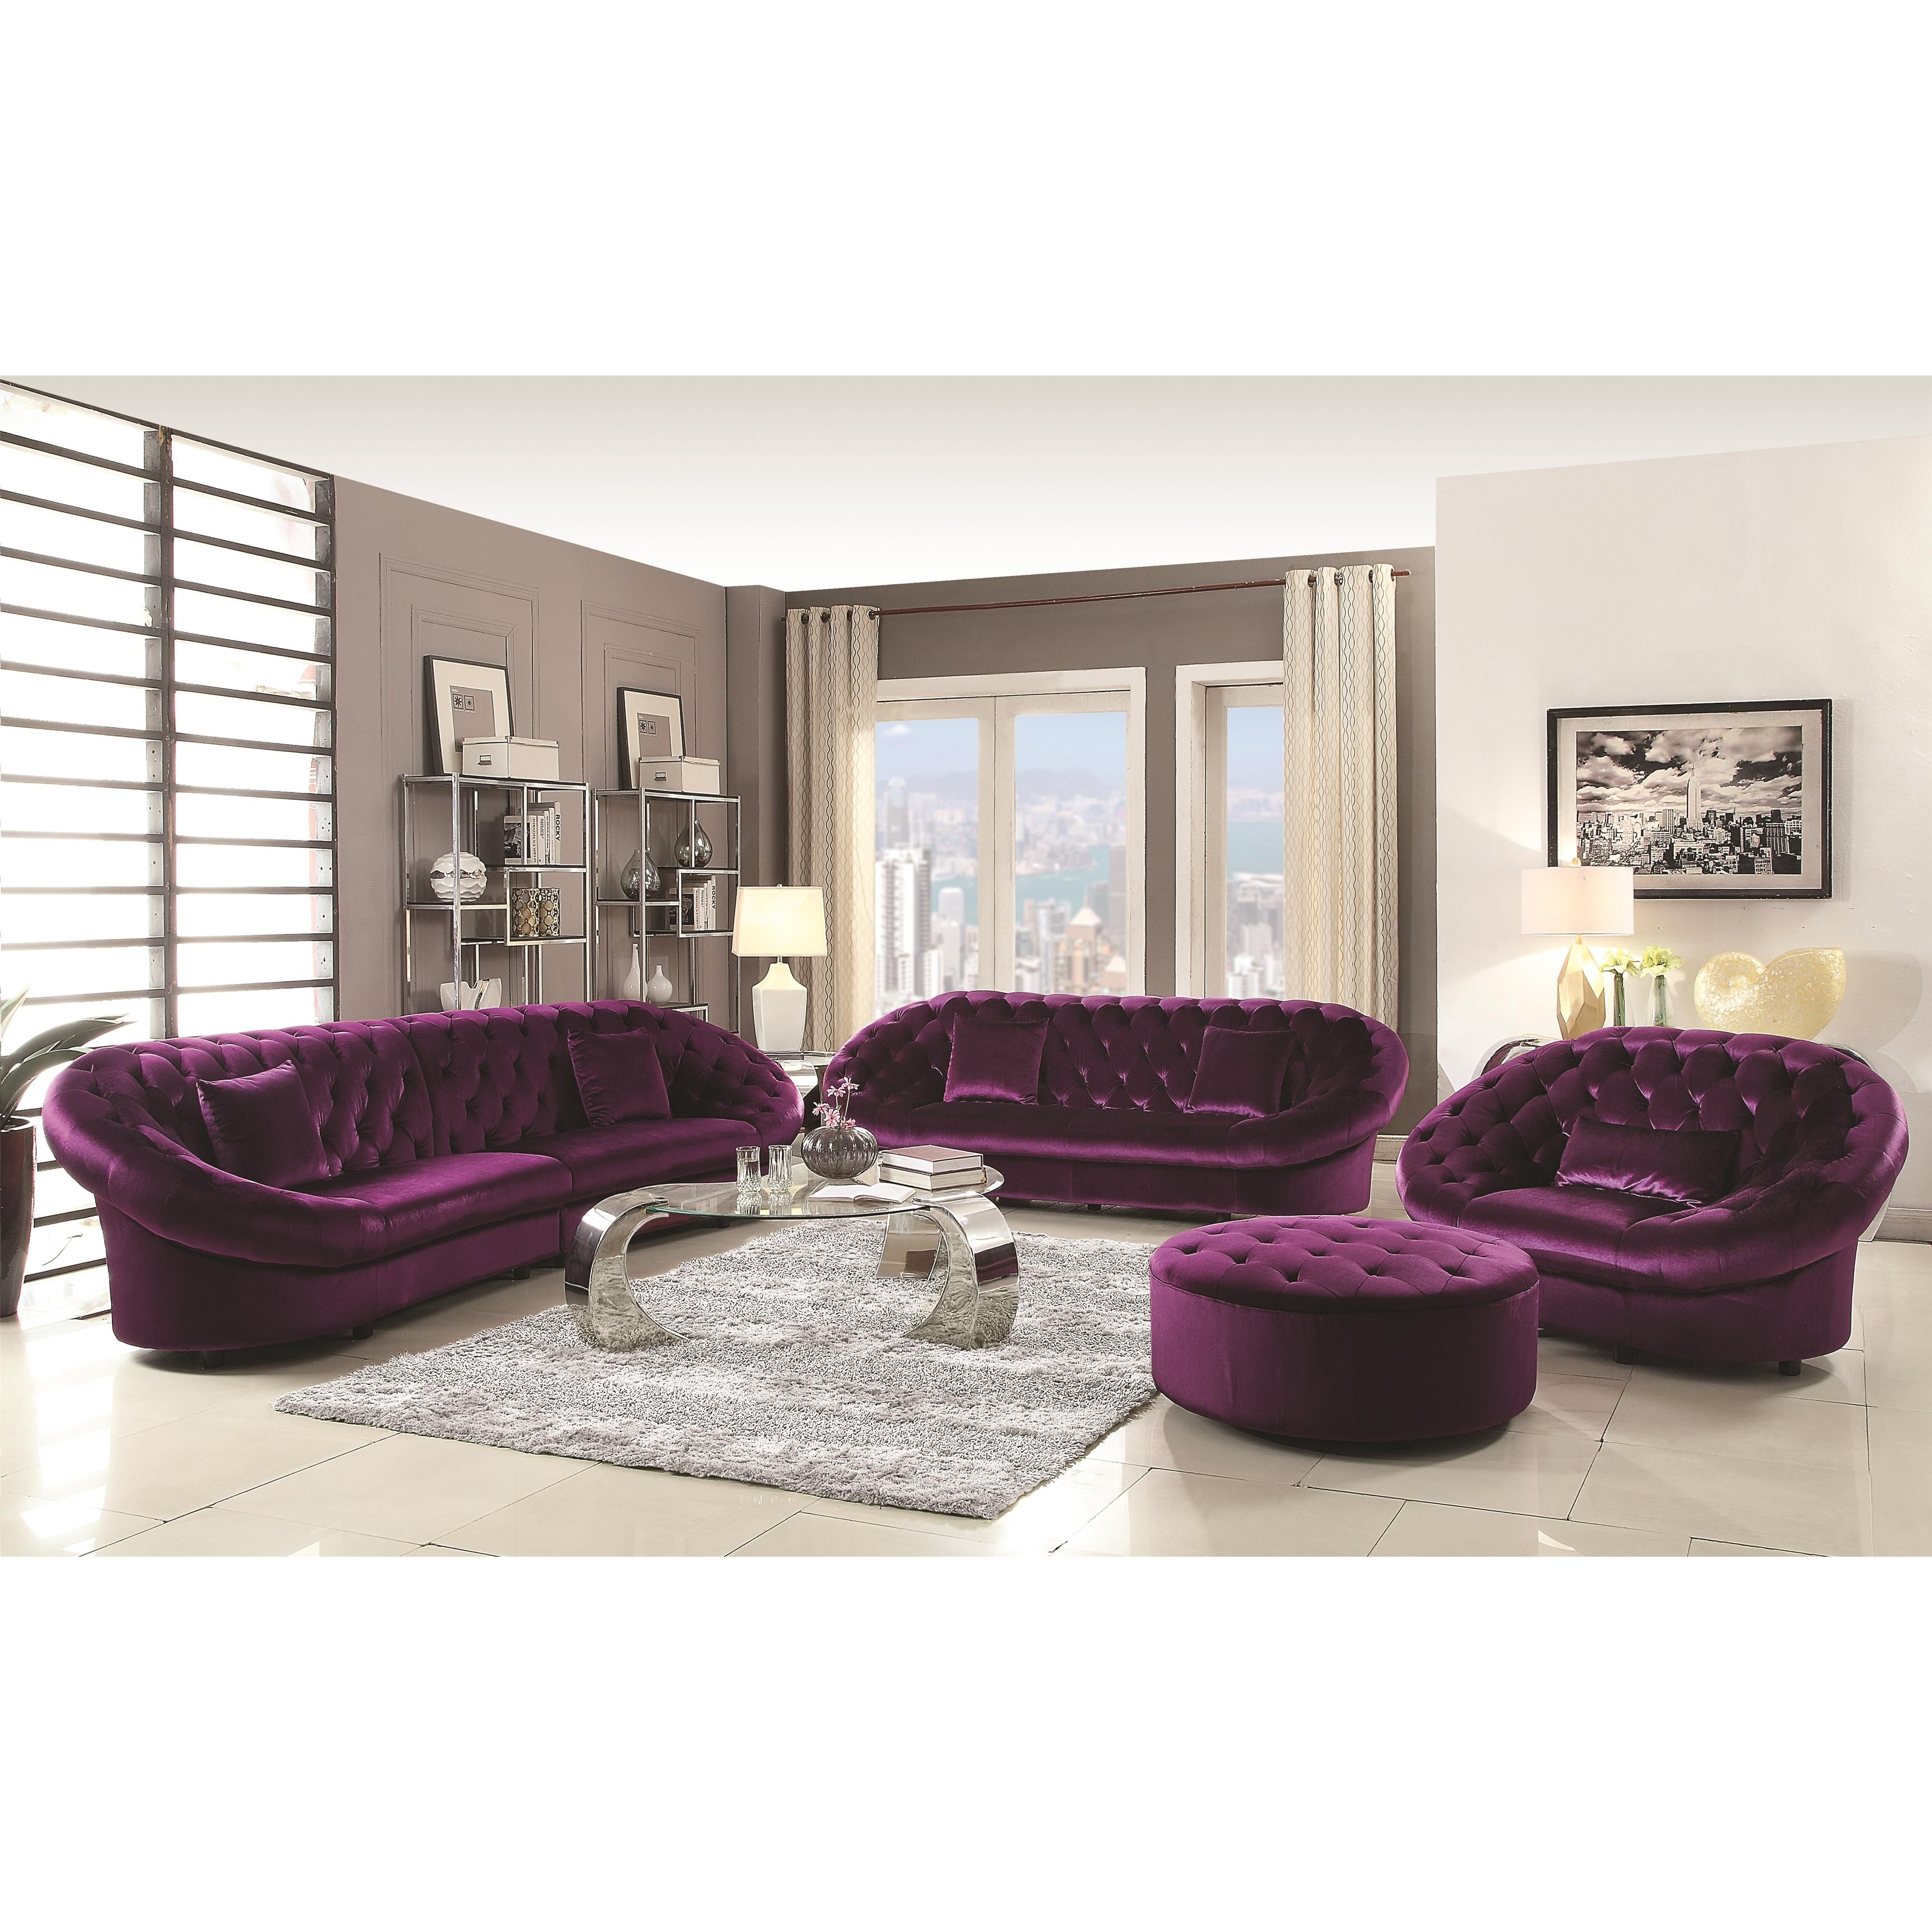 10 Best Ideas Philadelphia Sectional Sofas Sofa Ideas